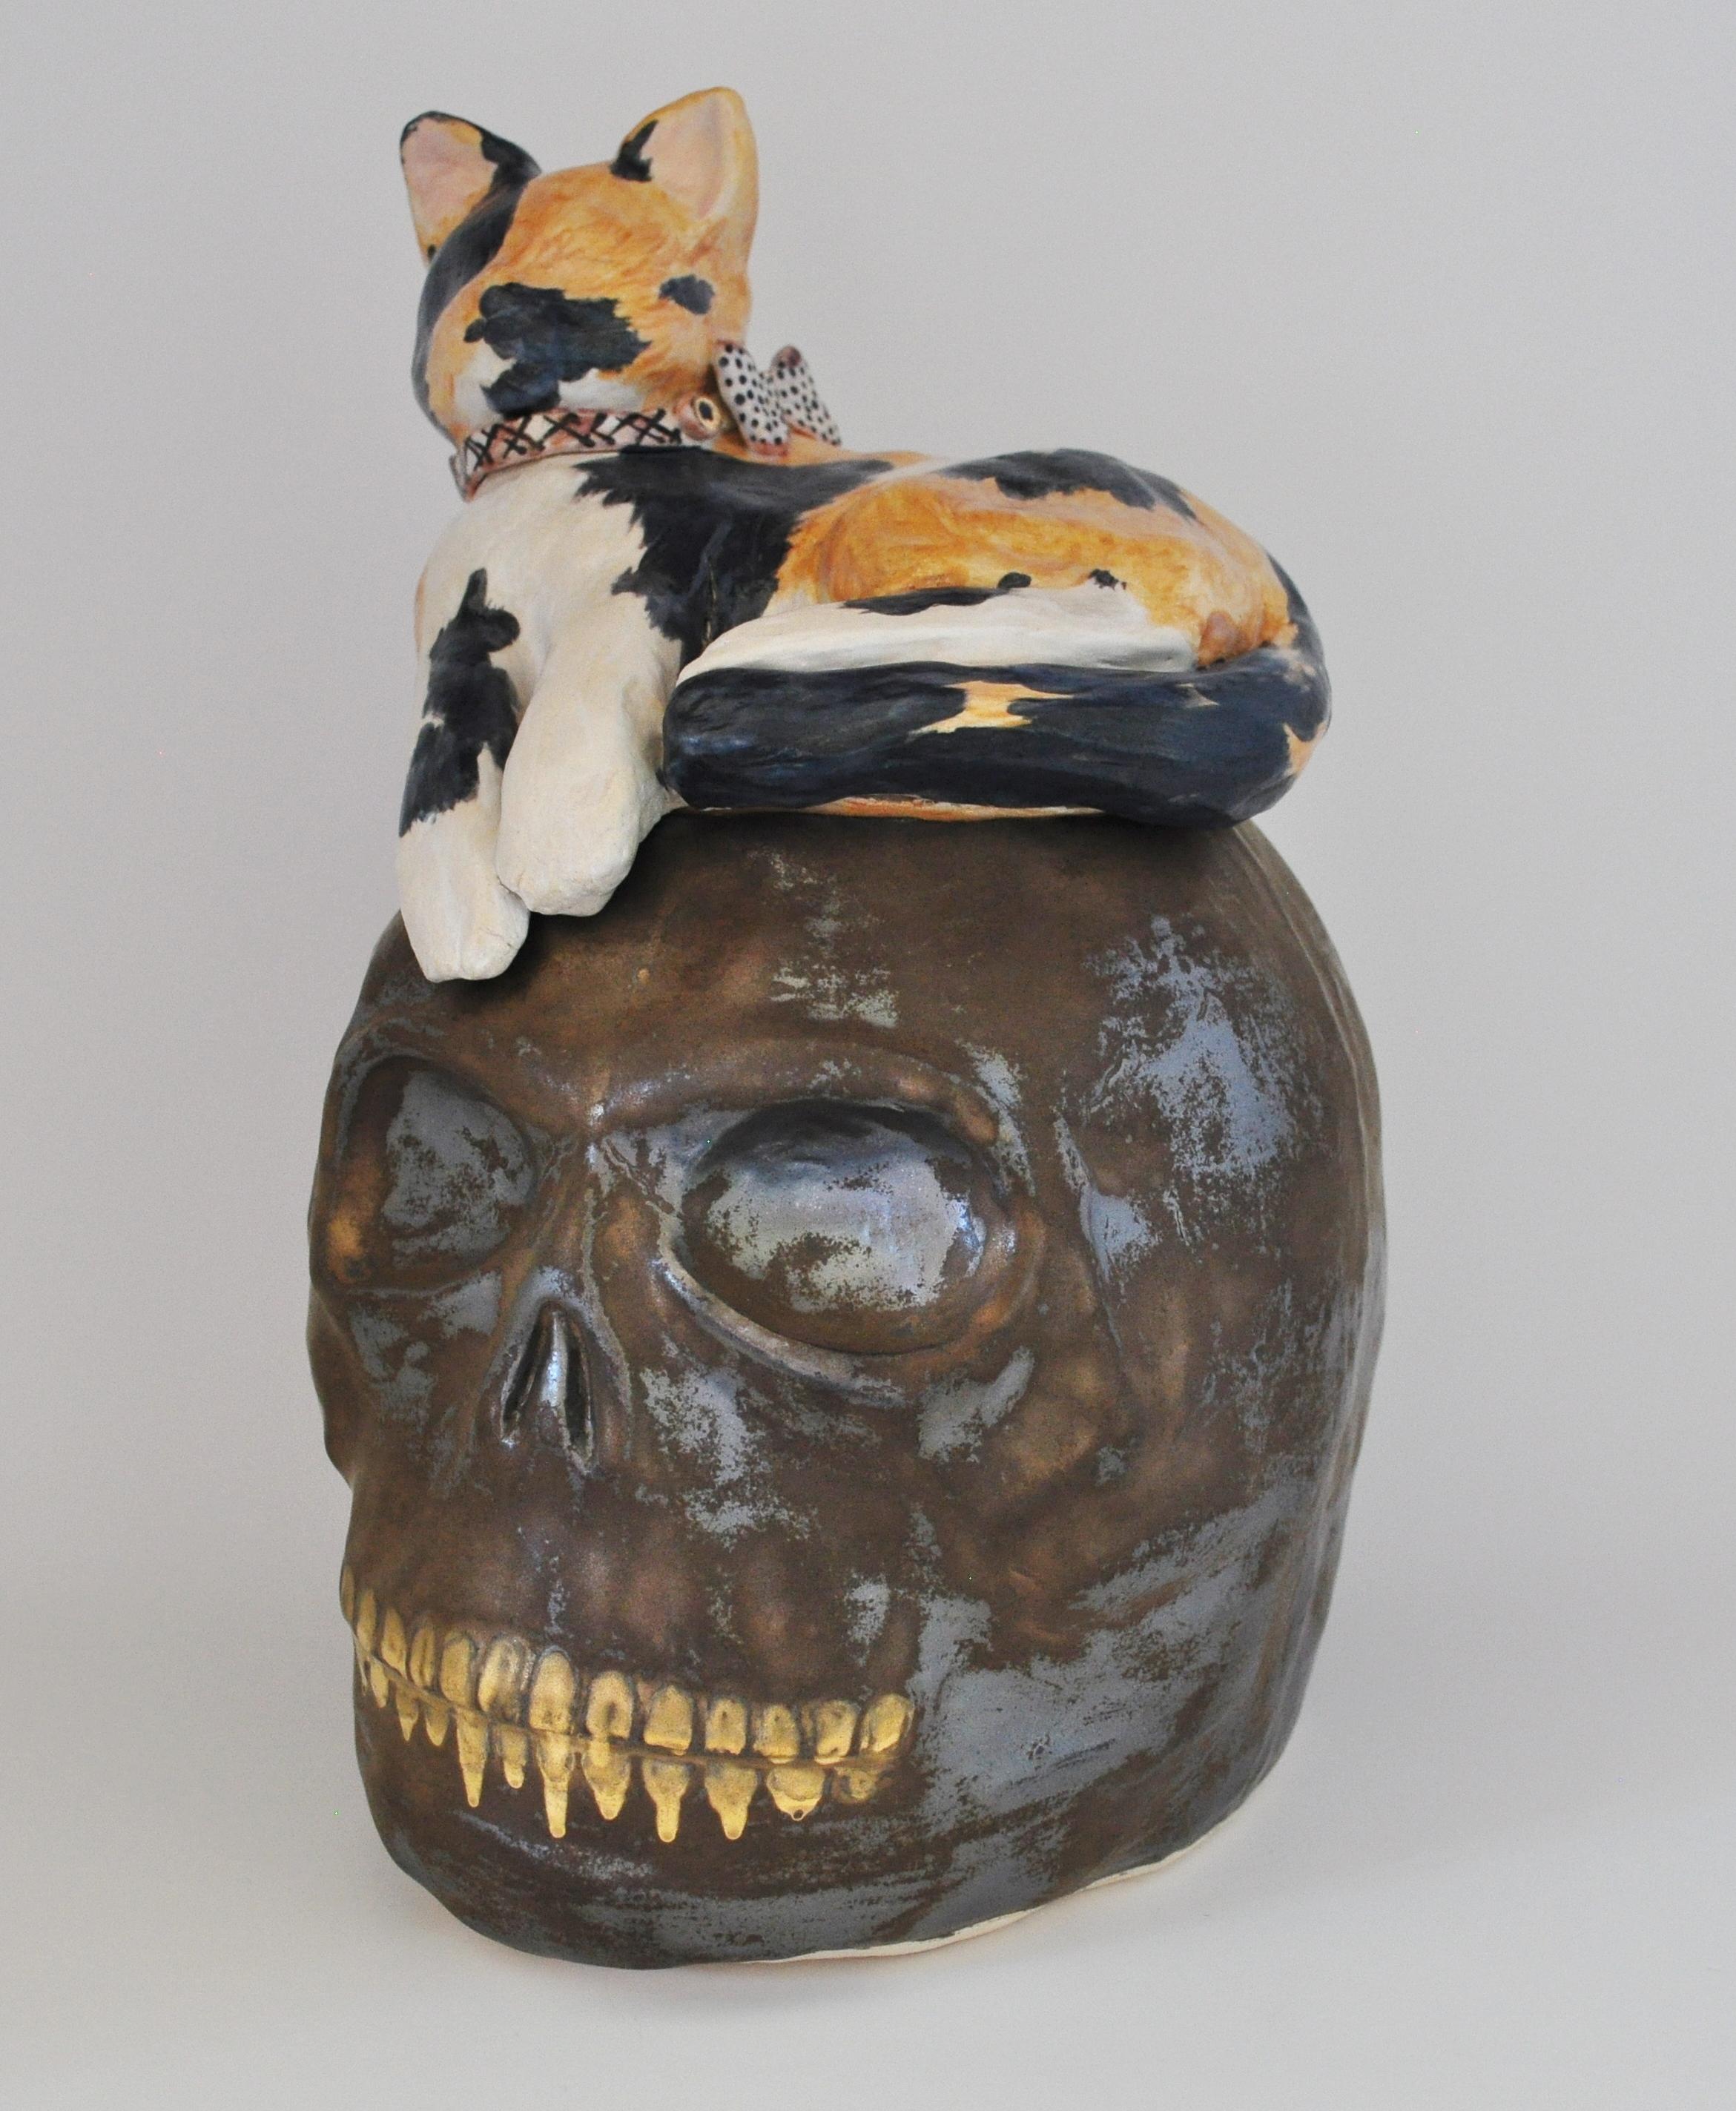 Pussy, Cat Skull cookie jar